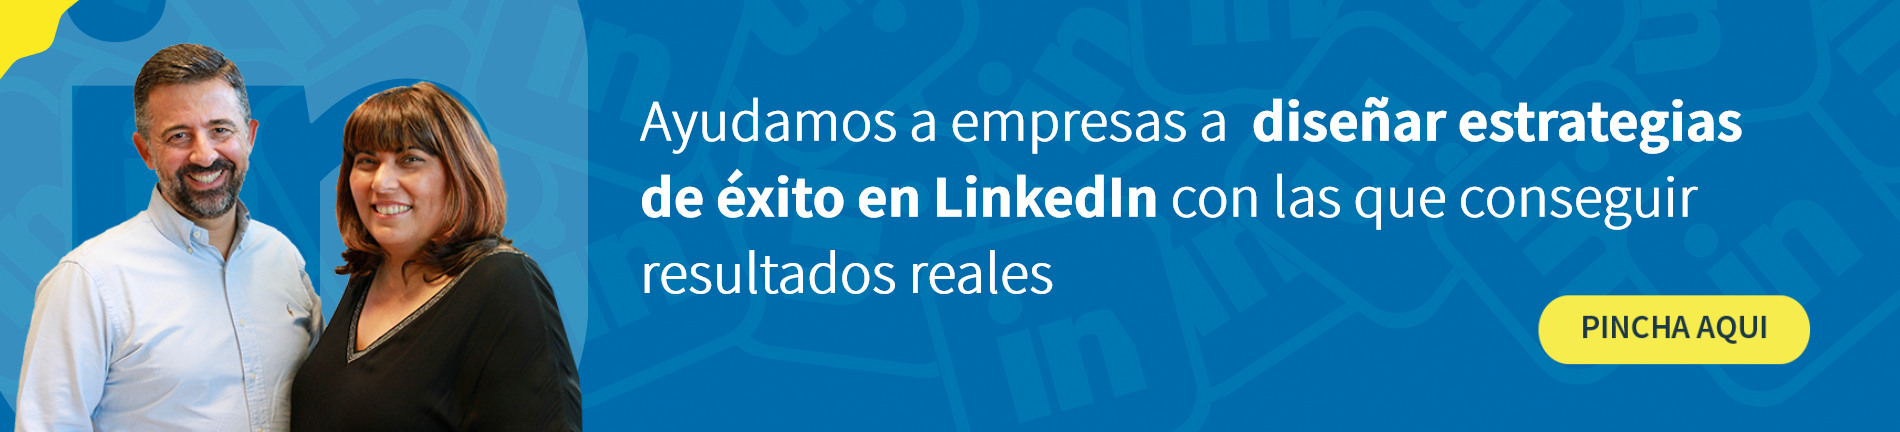 Estrategia LinkedIn